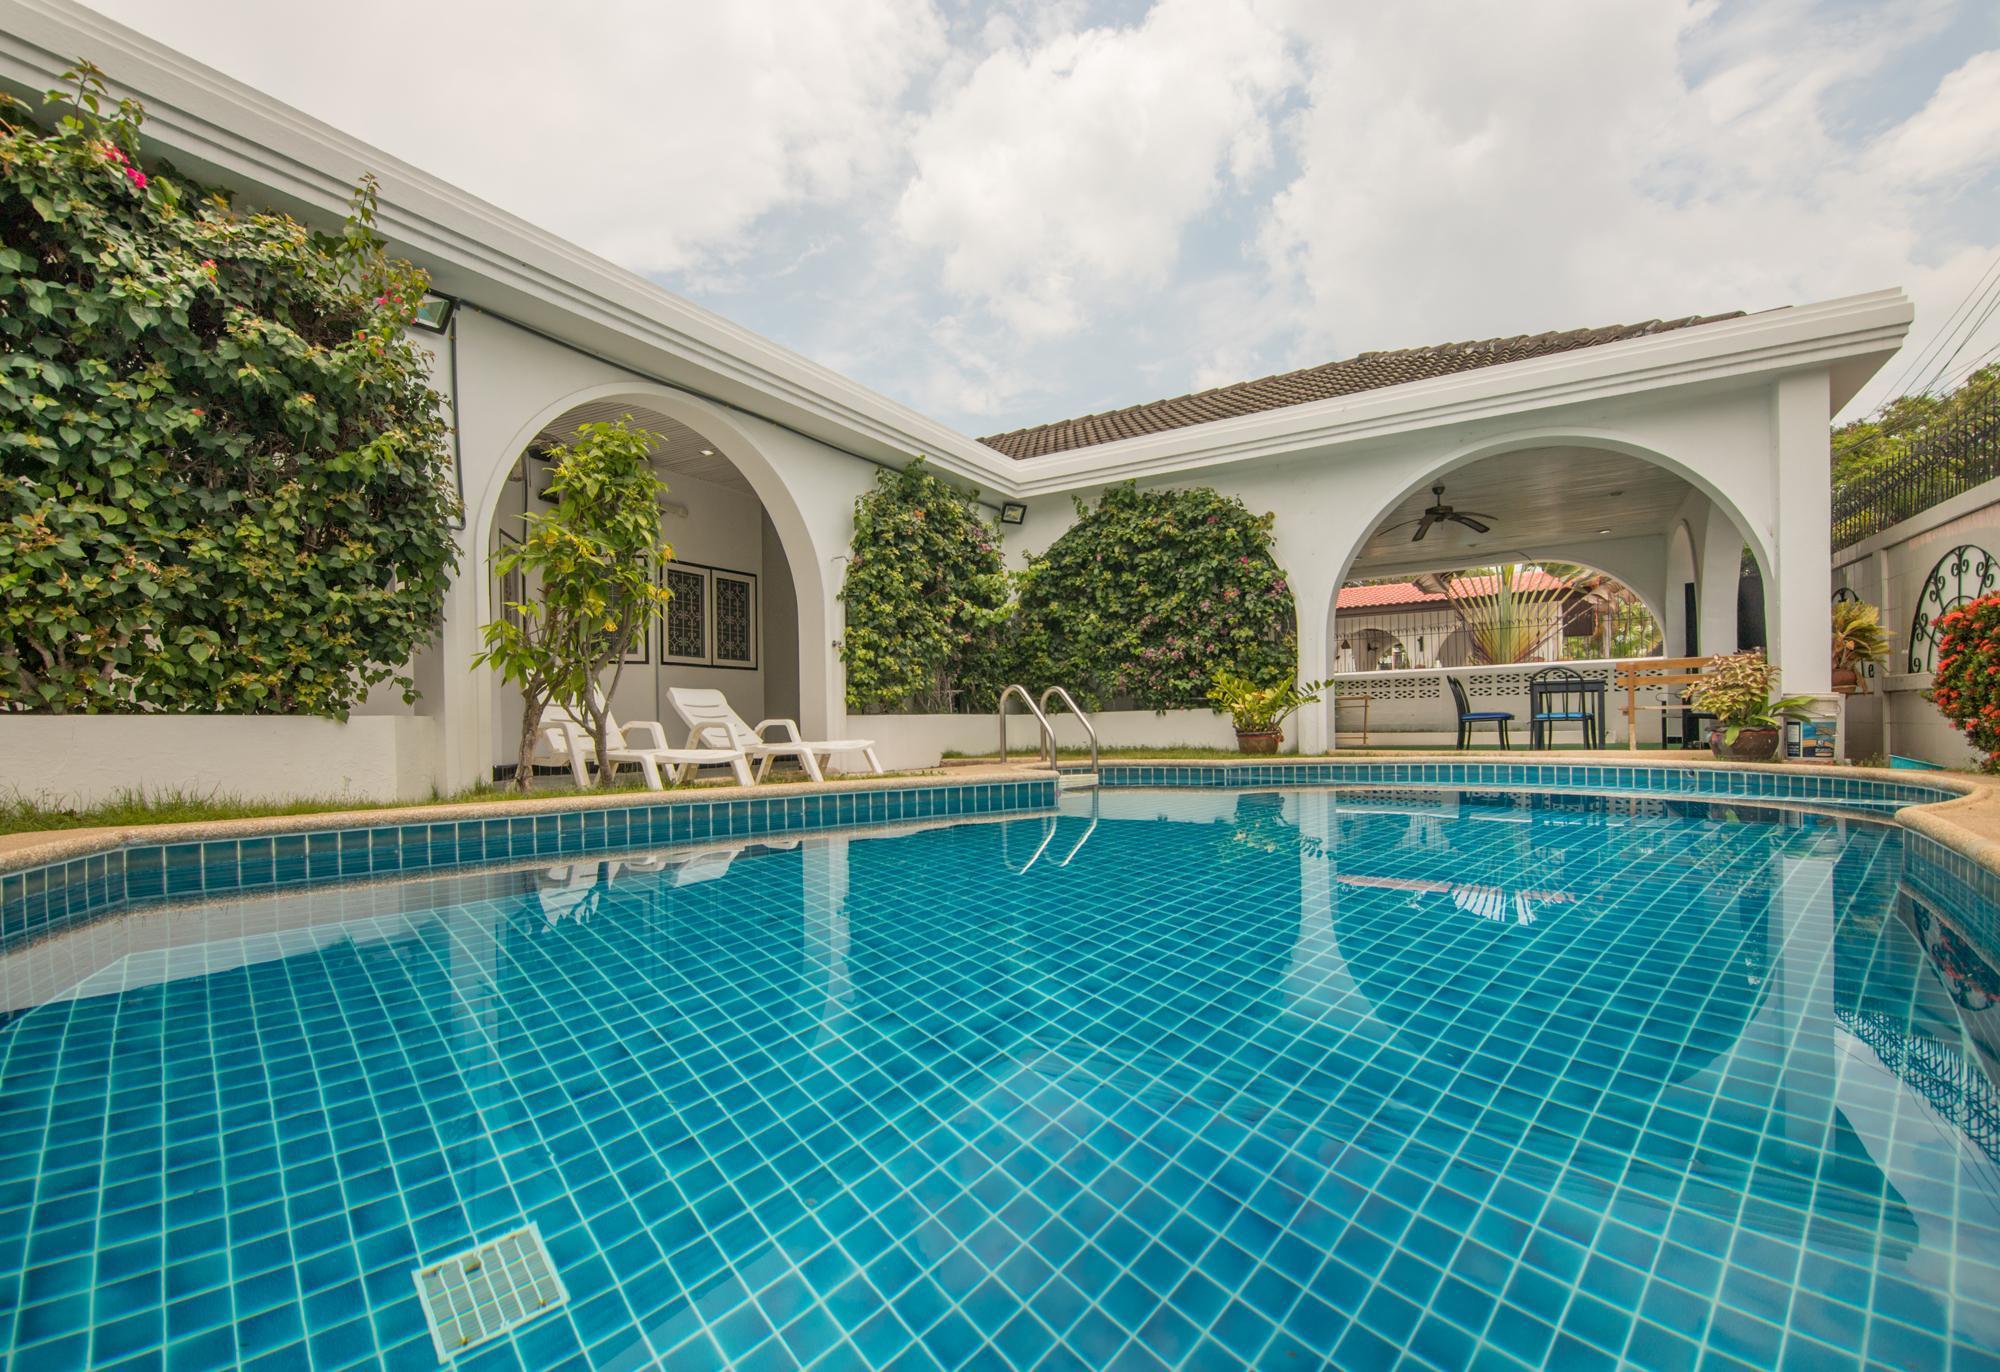 5 Rooms Big Private Villa Skittles